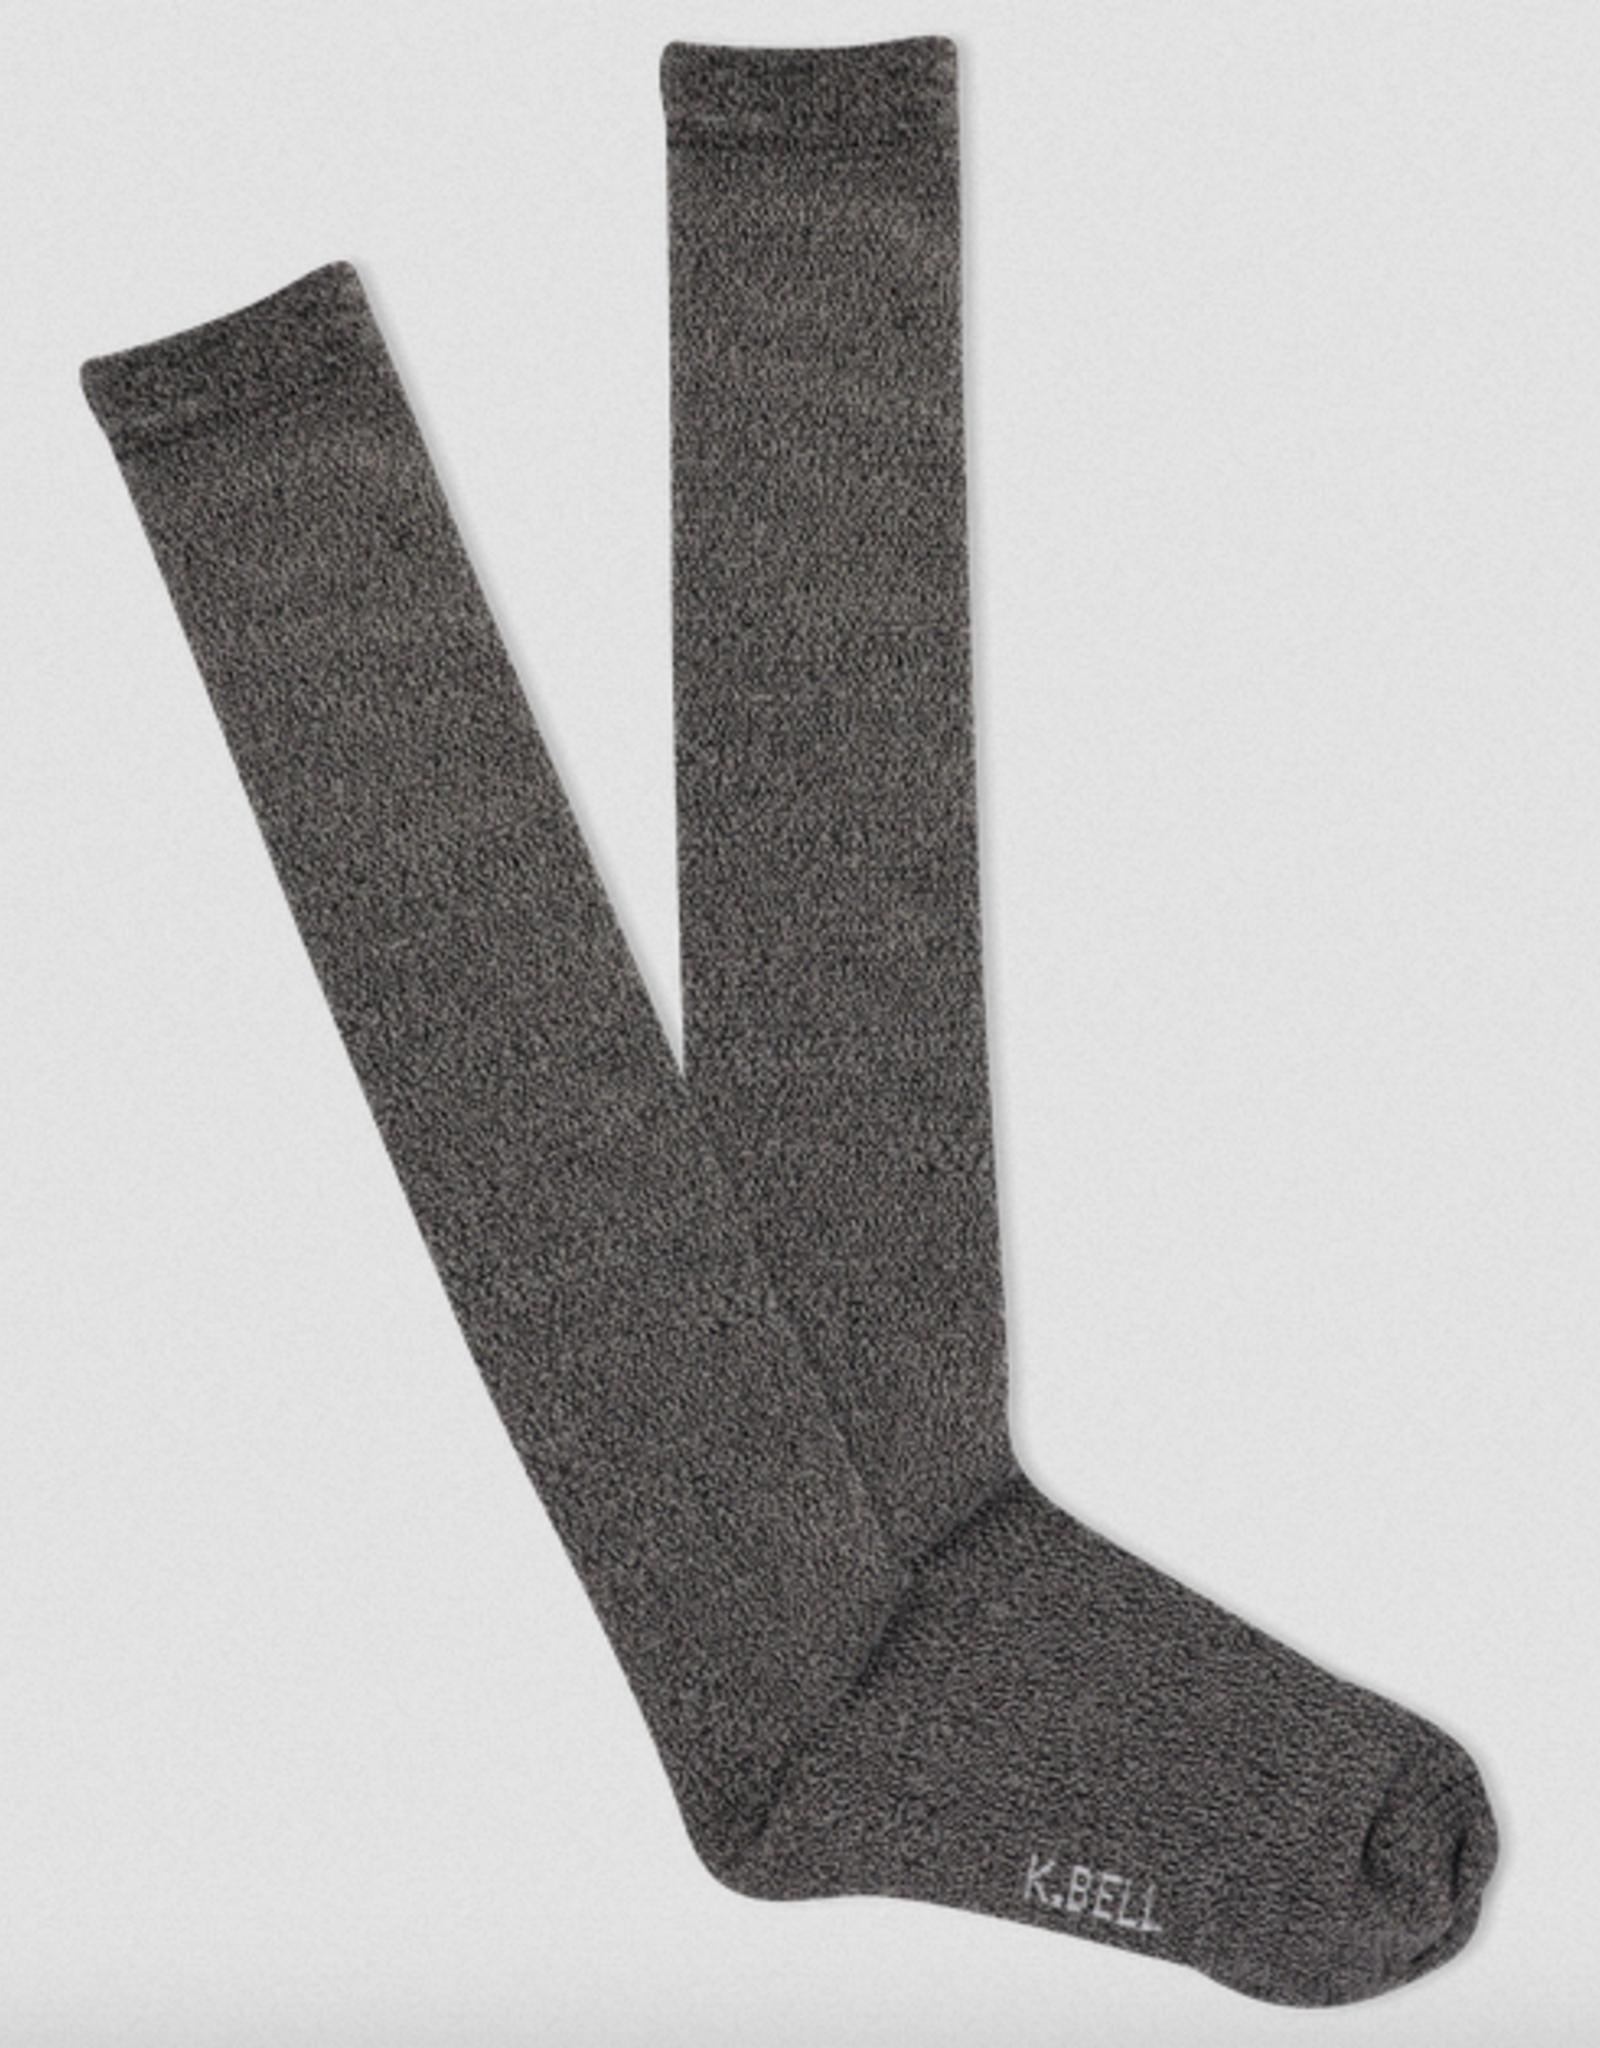 K. Bell Ladies' Super Soft Marl Knee High Sock